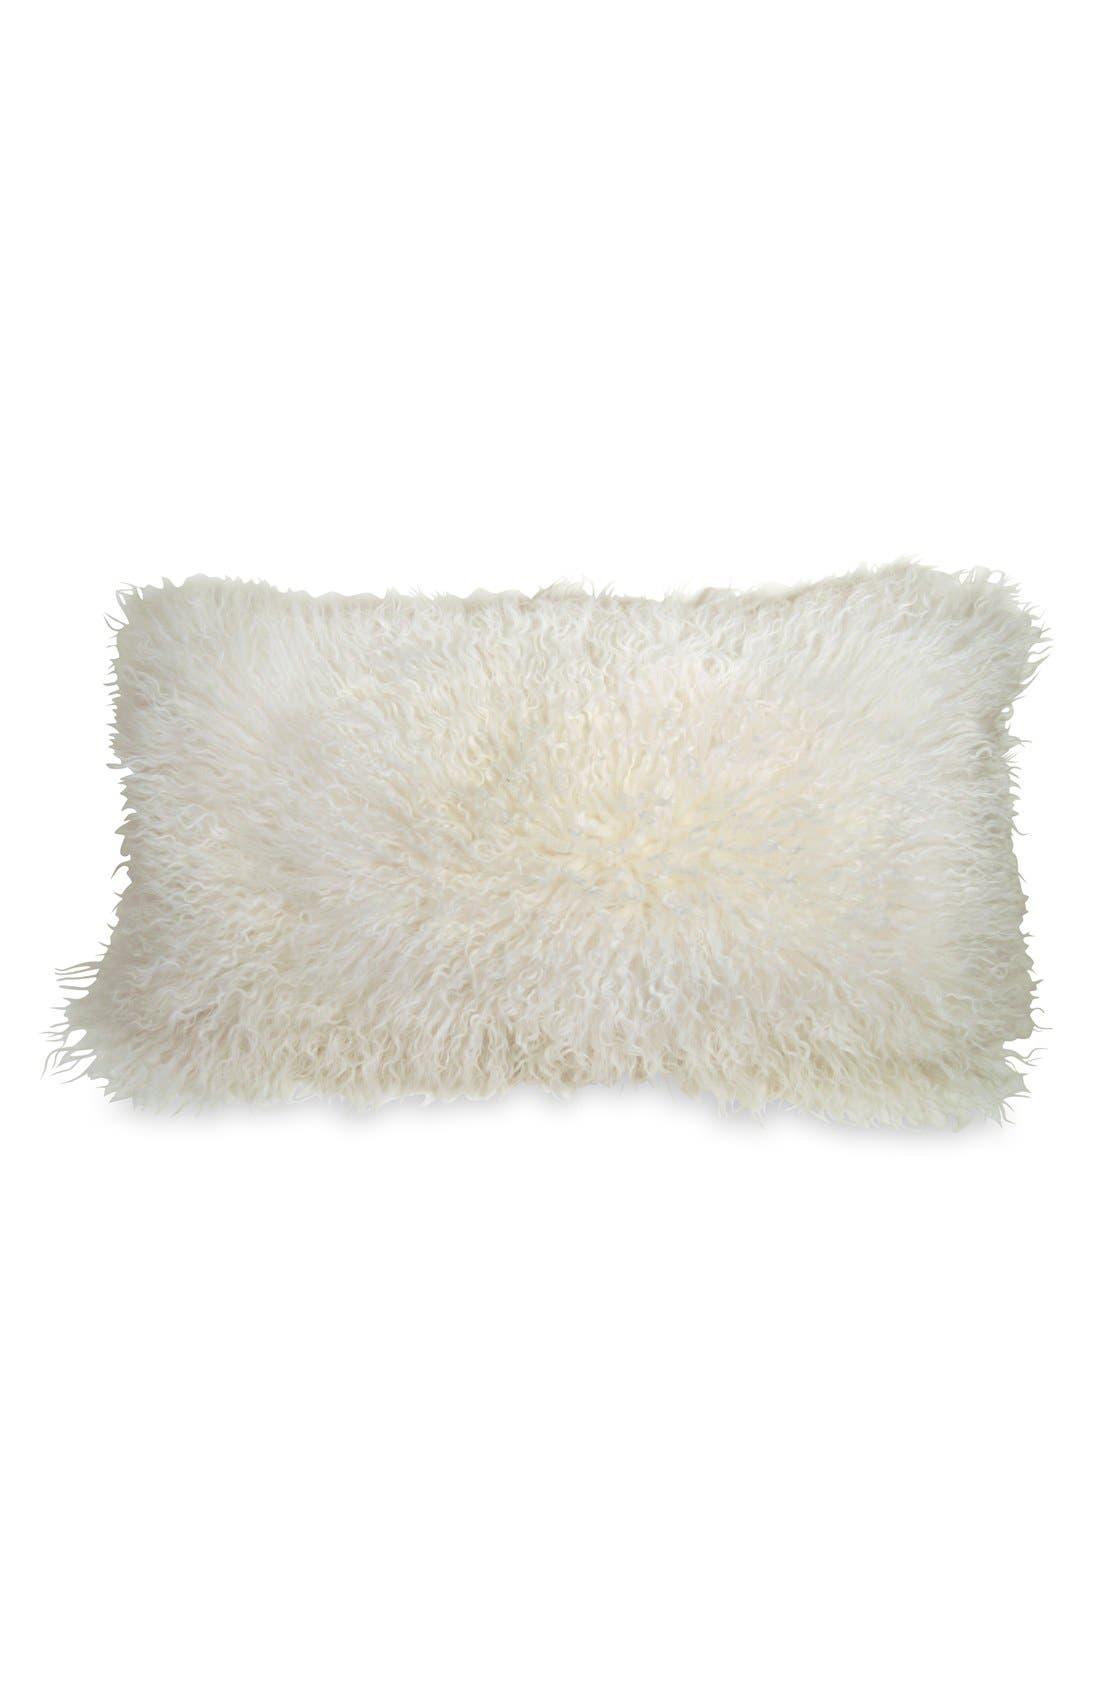 Donna Karan Collection Moonscape Flokati Genuine Sheepskin Pillow,                         Main,                         color, Ivory